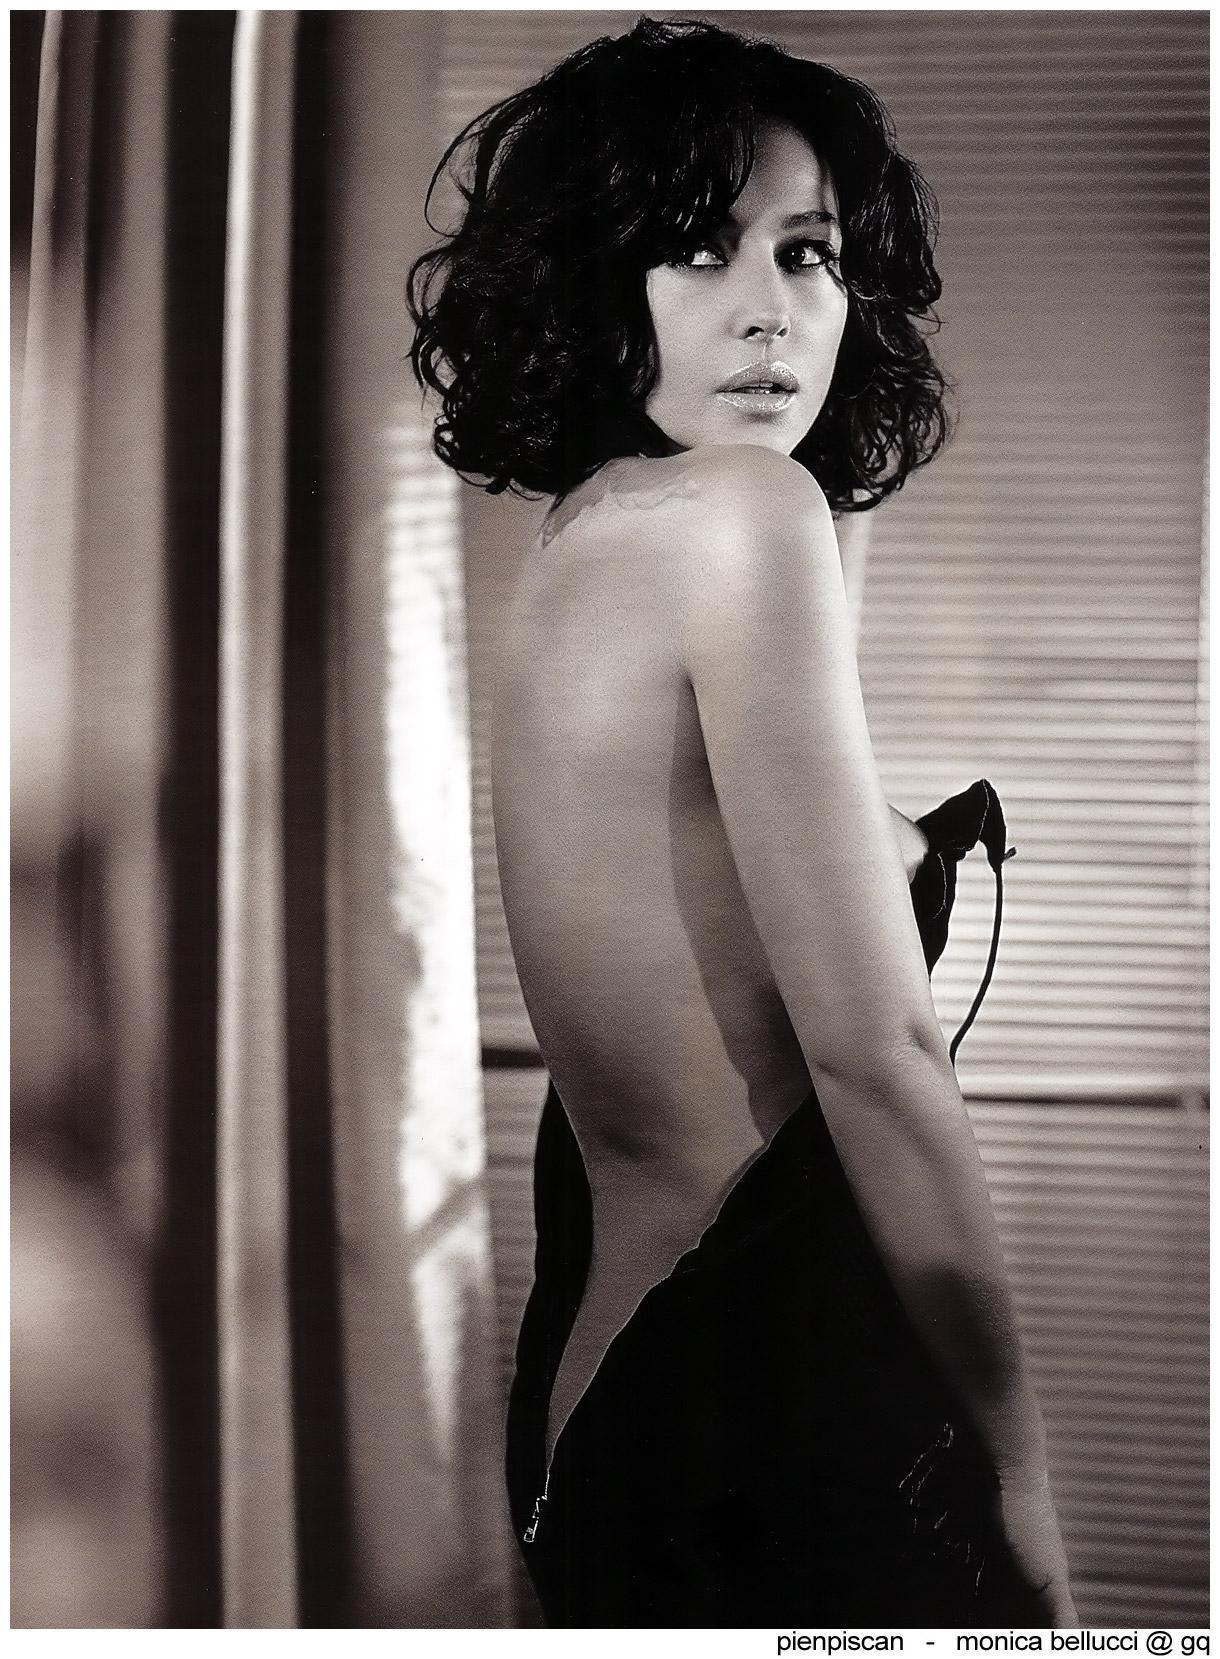 Monica Bellucci desnudándose